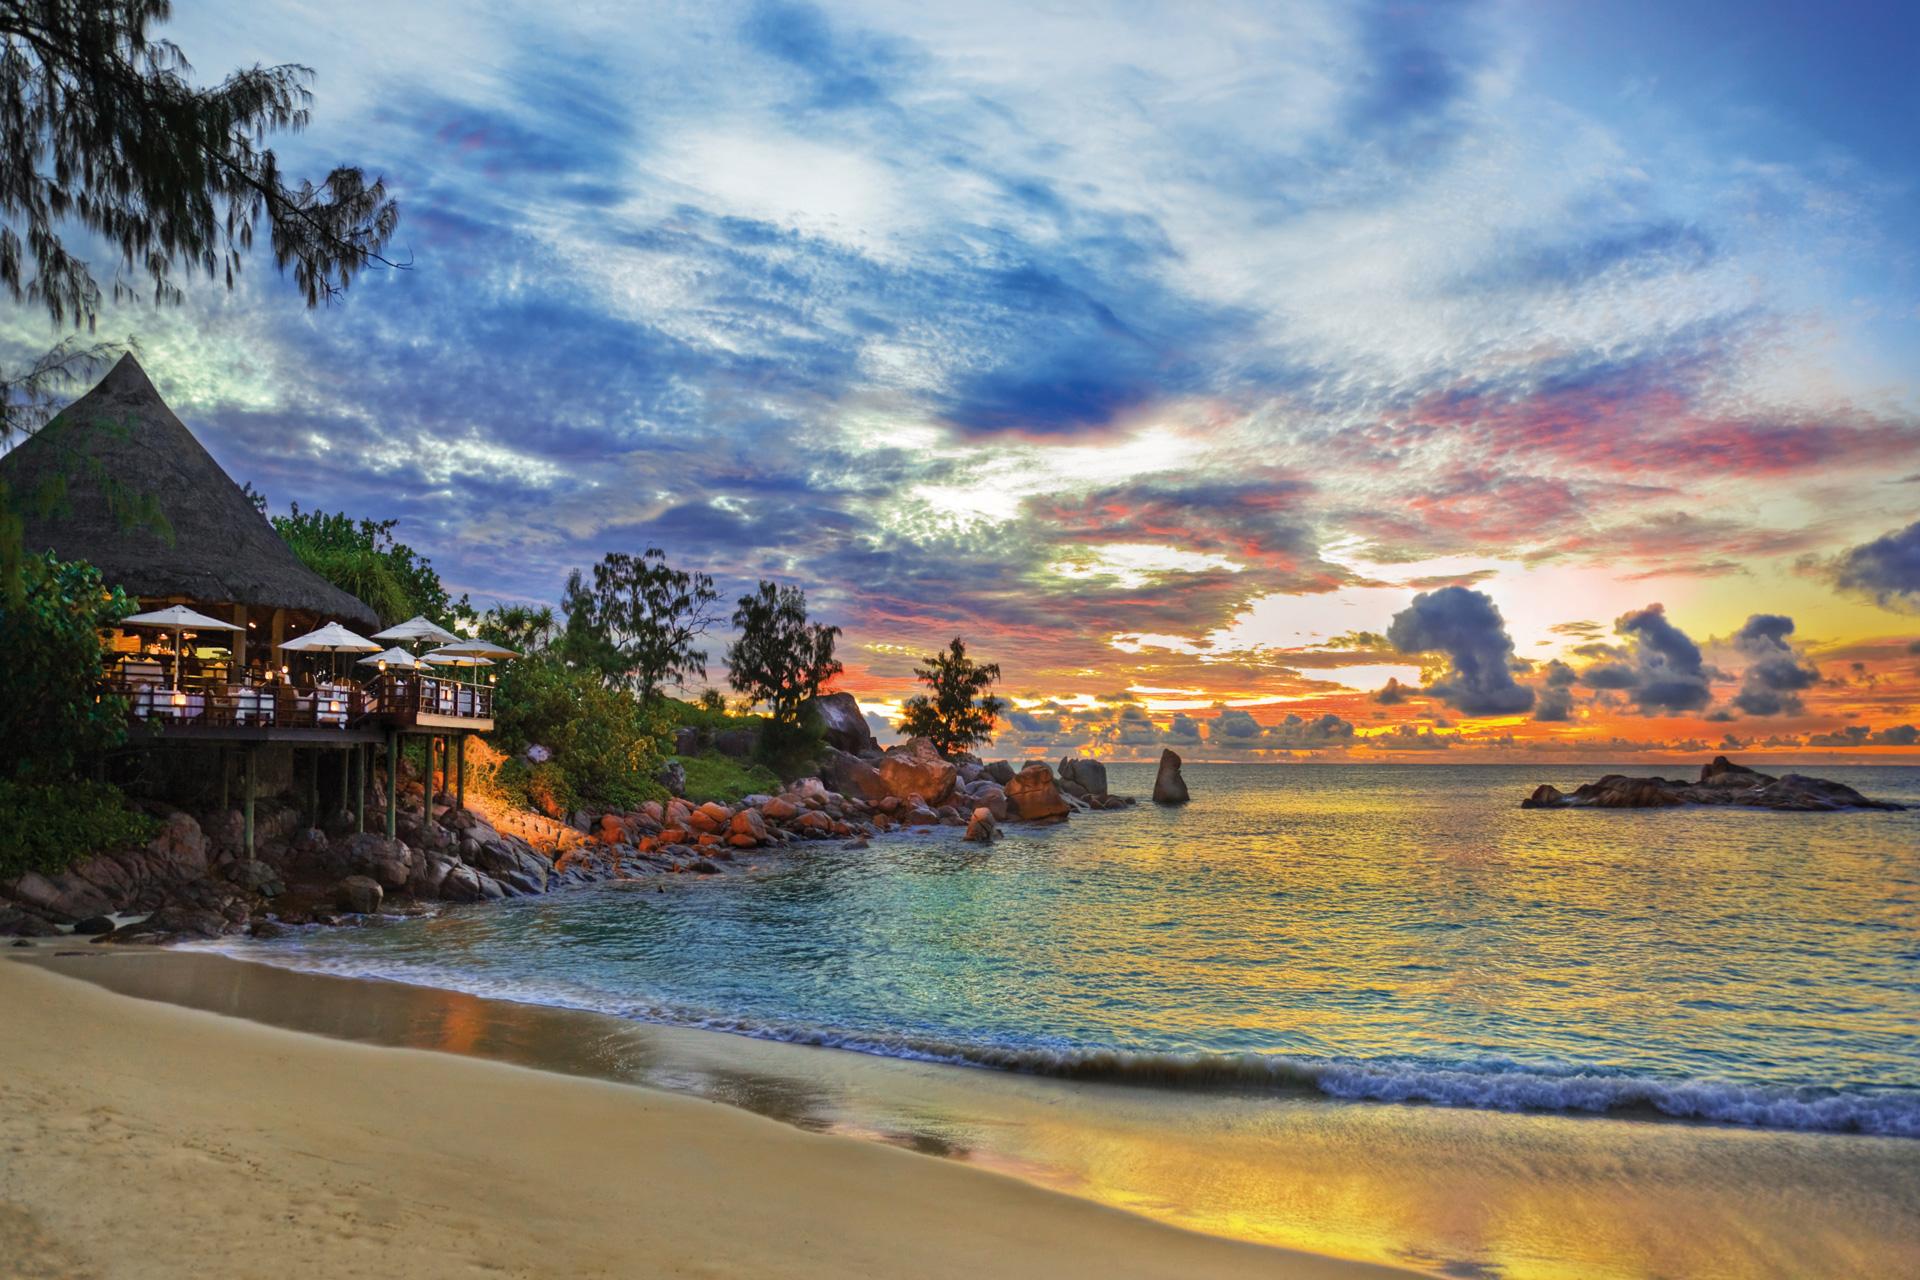 Sonnenuntergang, Thailand